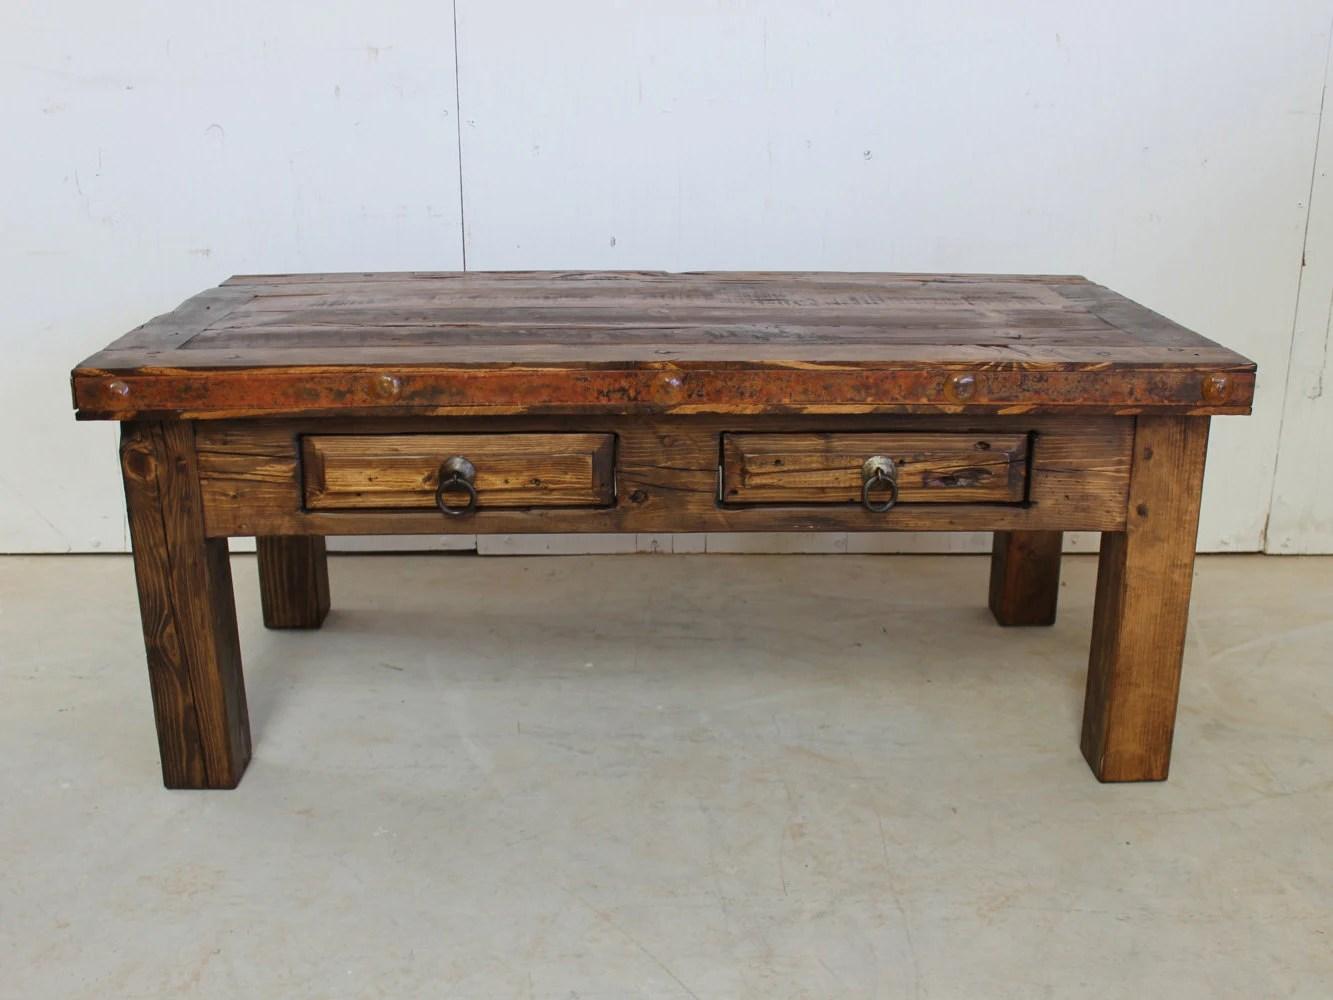 Rustic Coffee Table Reclaimed Wood Southwestern Old